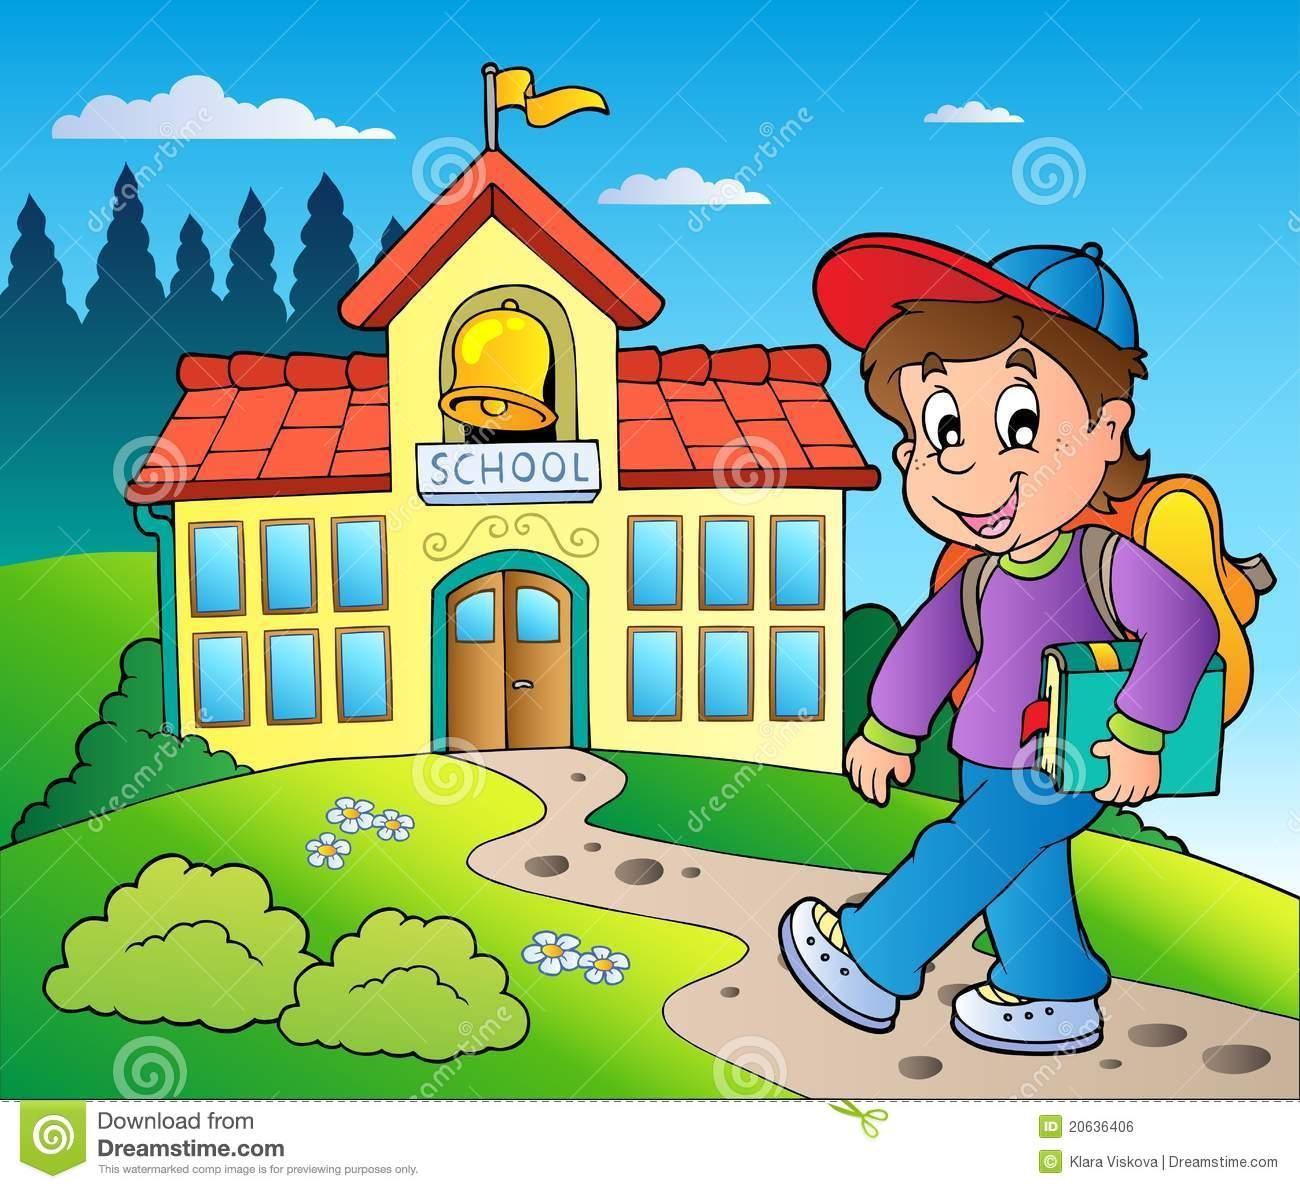 Theme with big school building. School Clipart Clipart Best